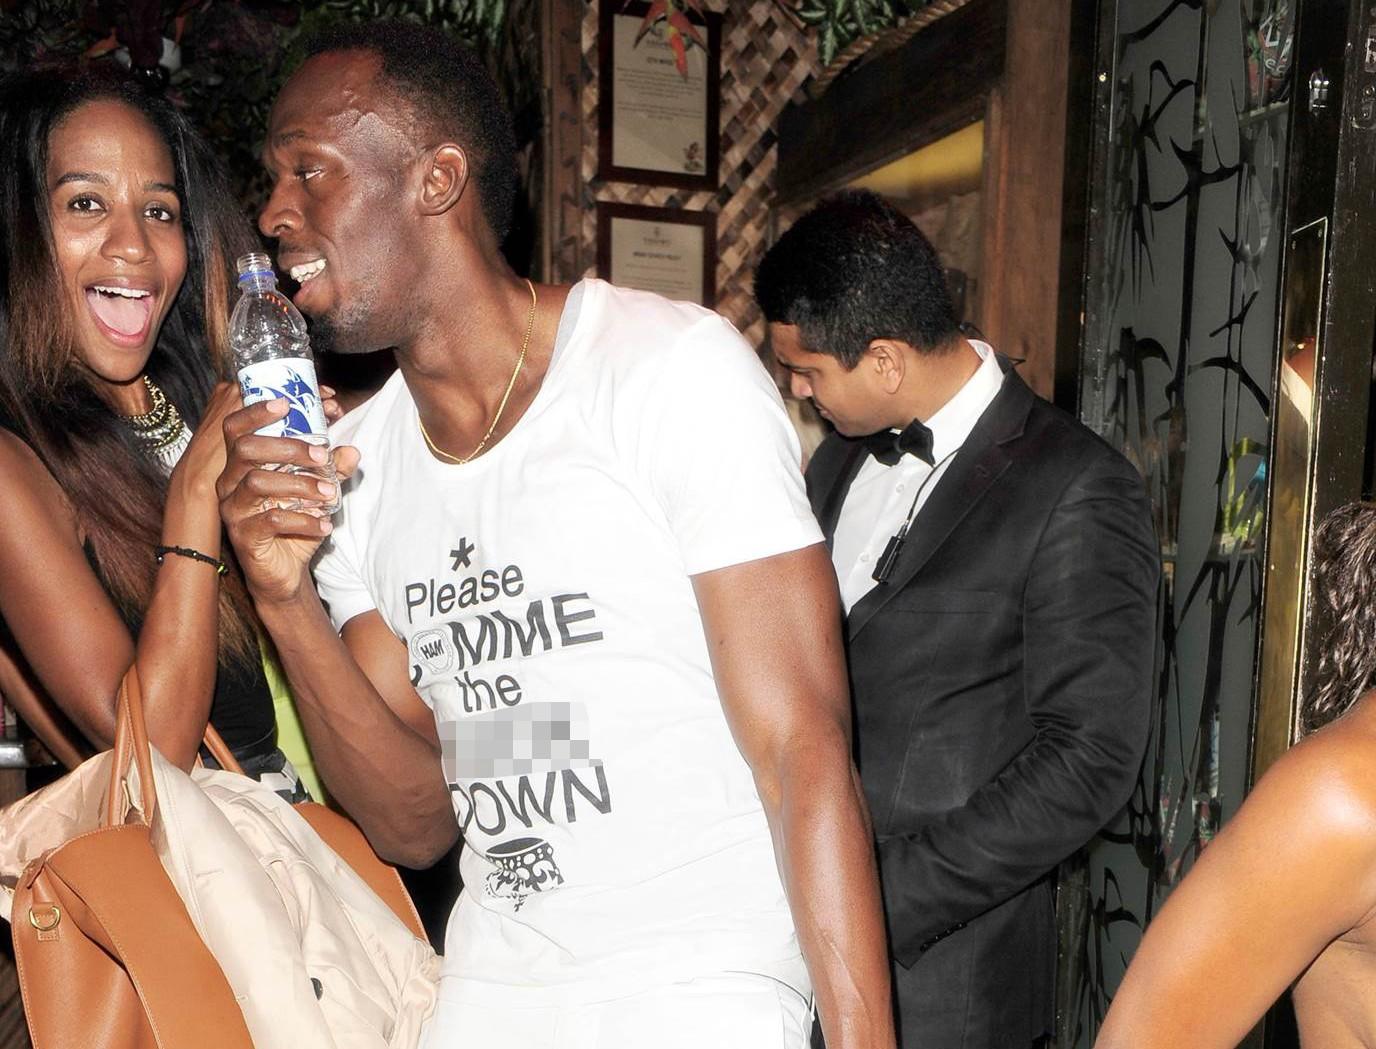 Apprentice's April Jackson in secret romance with Usain Bolt Credit: Vantage News